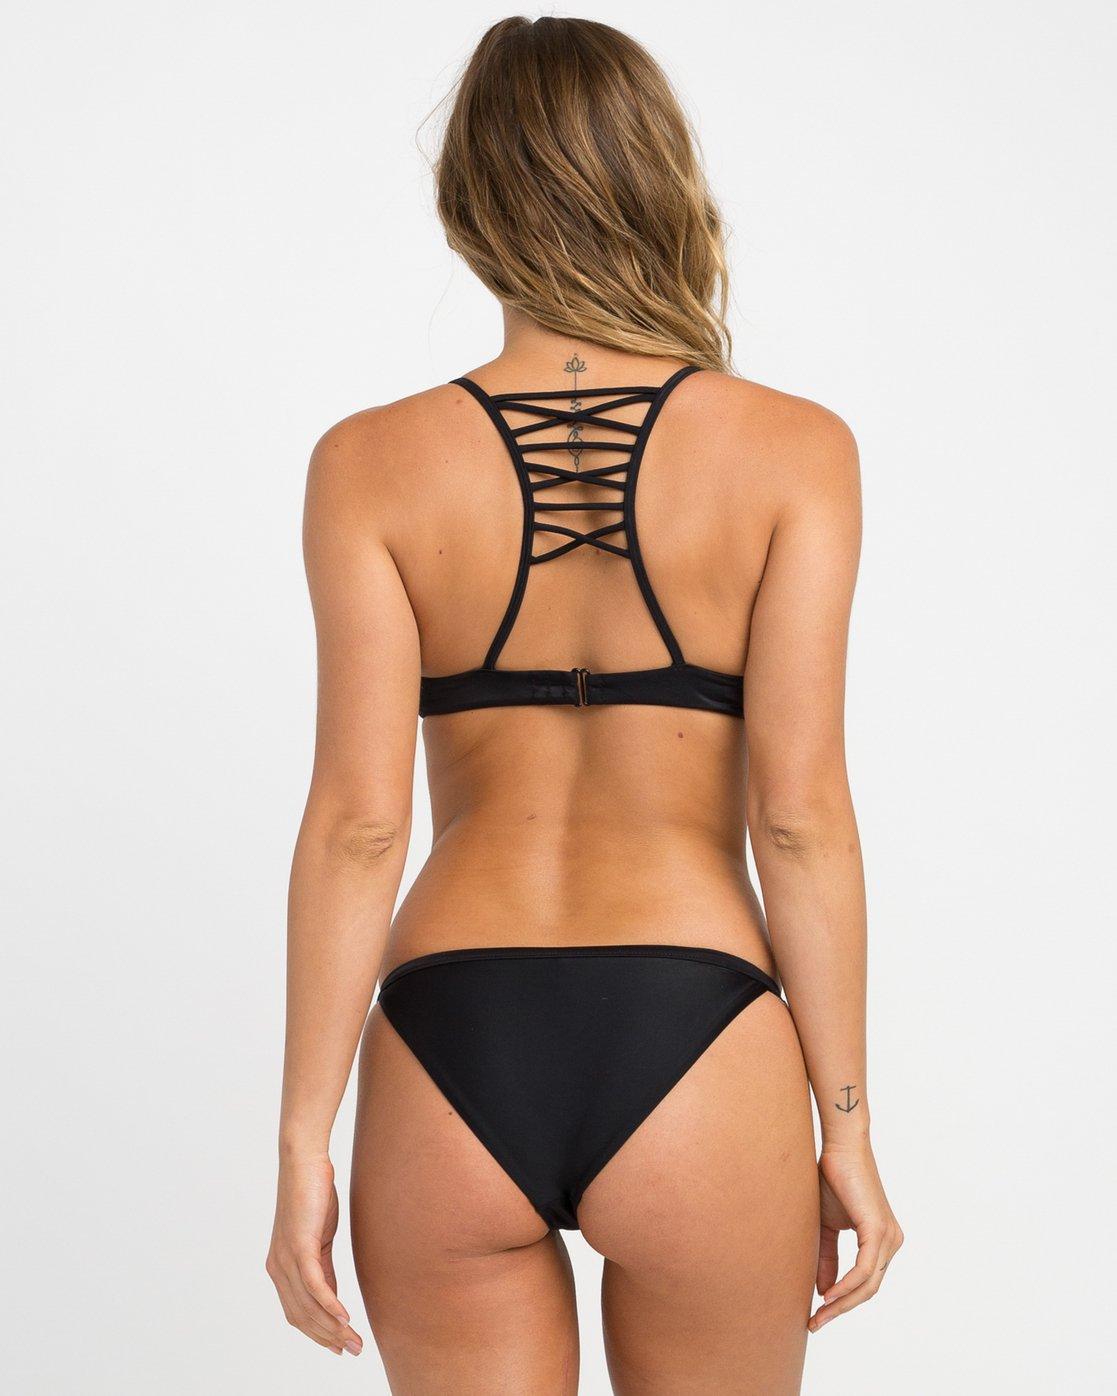 0 Solid Medium Bikini Bottoms Black SKXB01SM RVCA